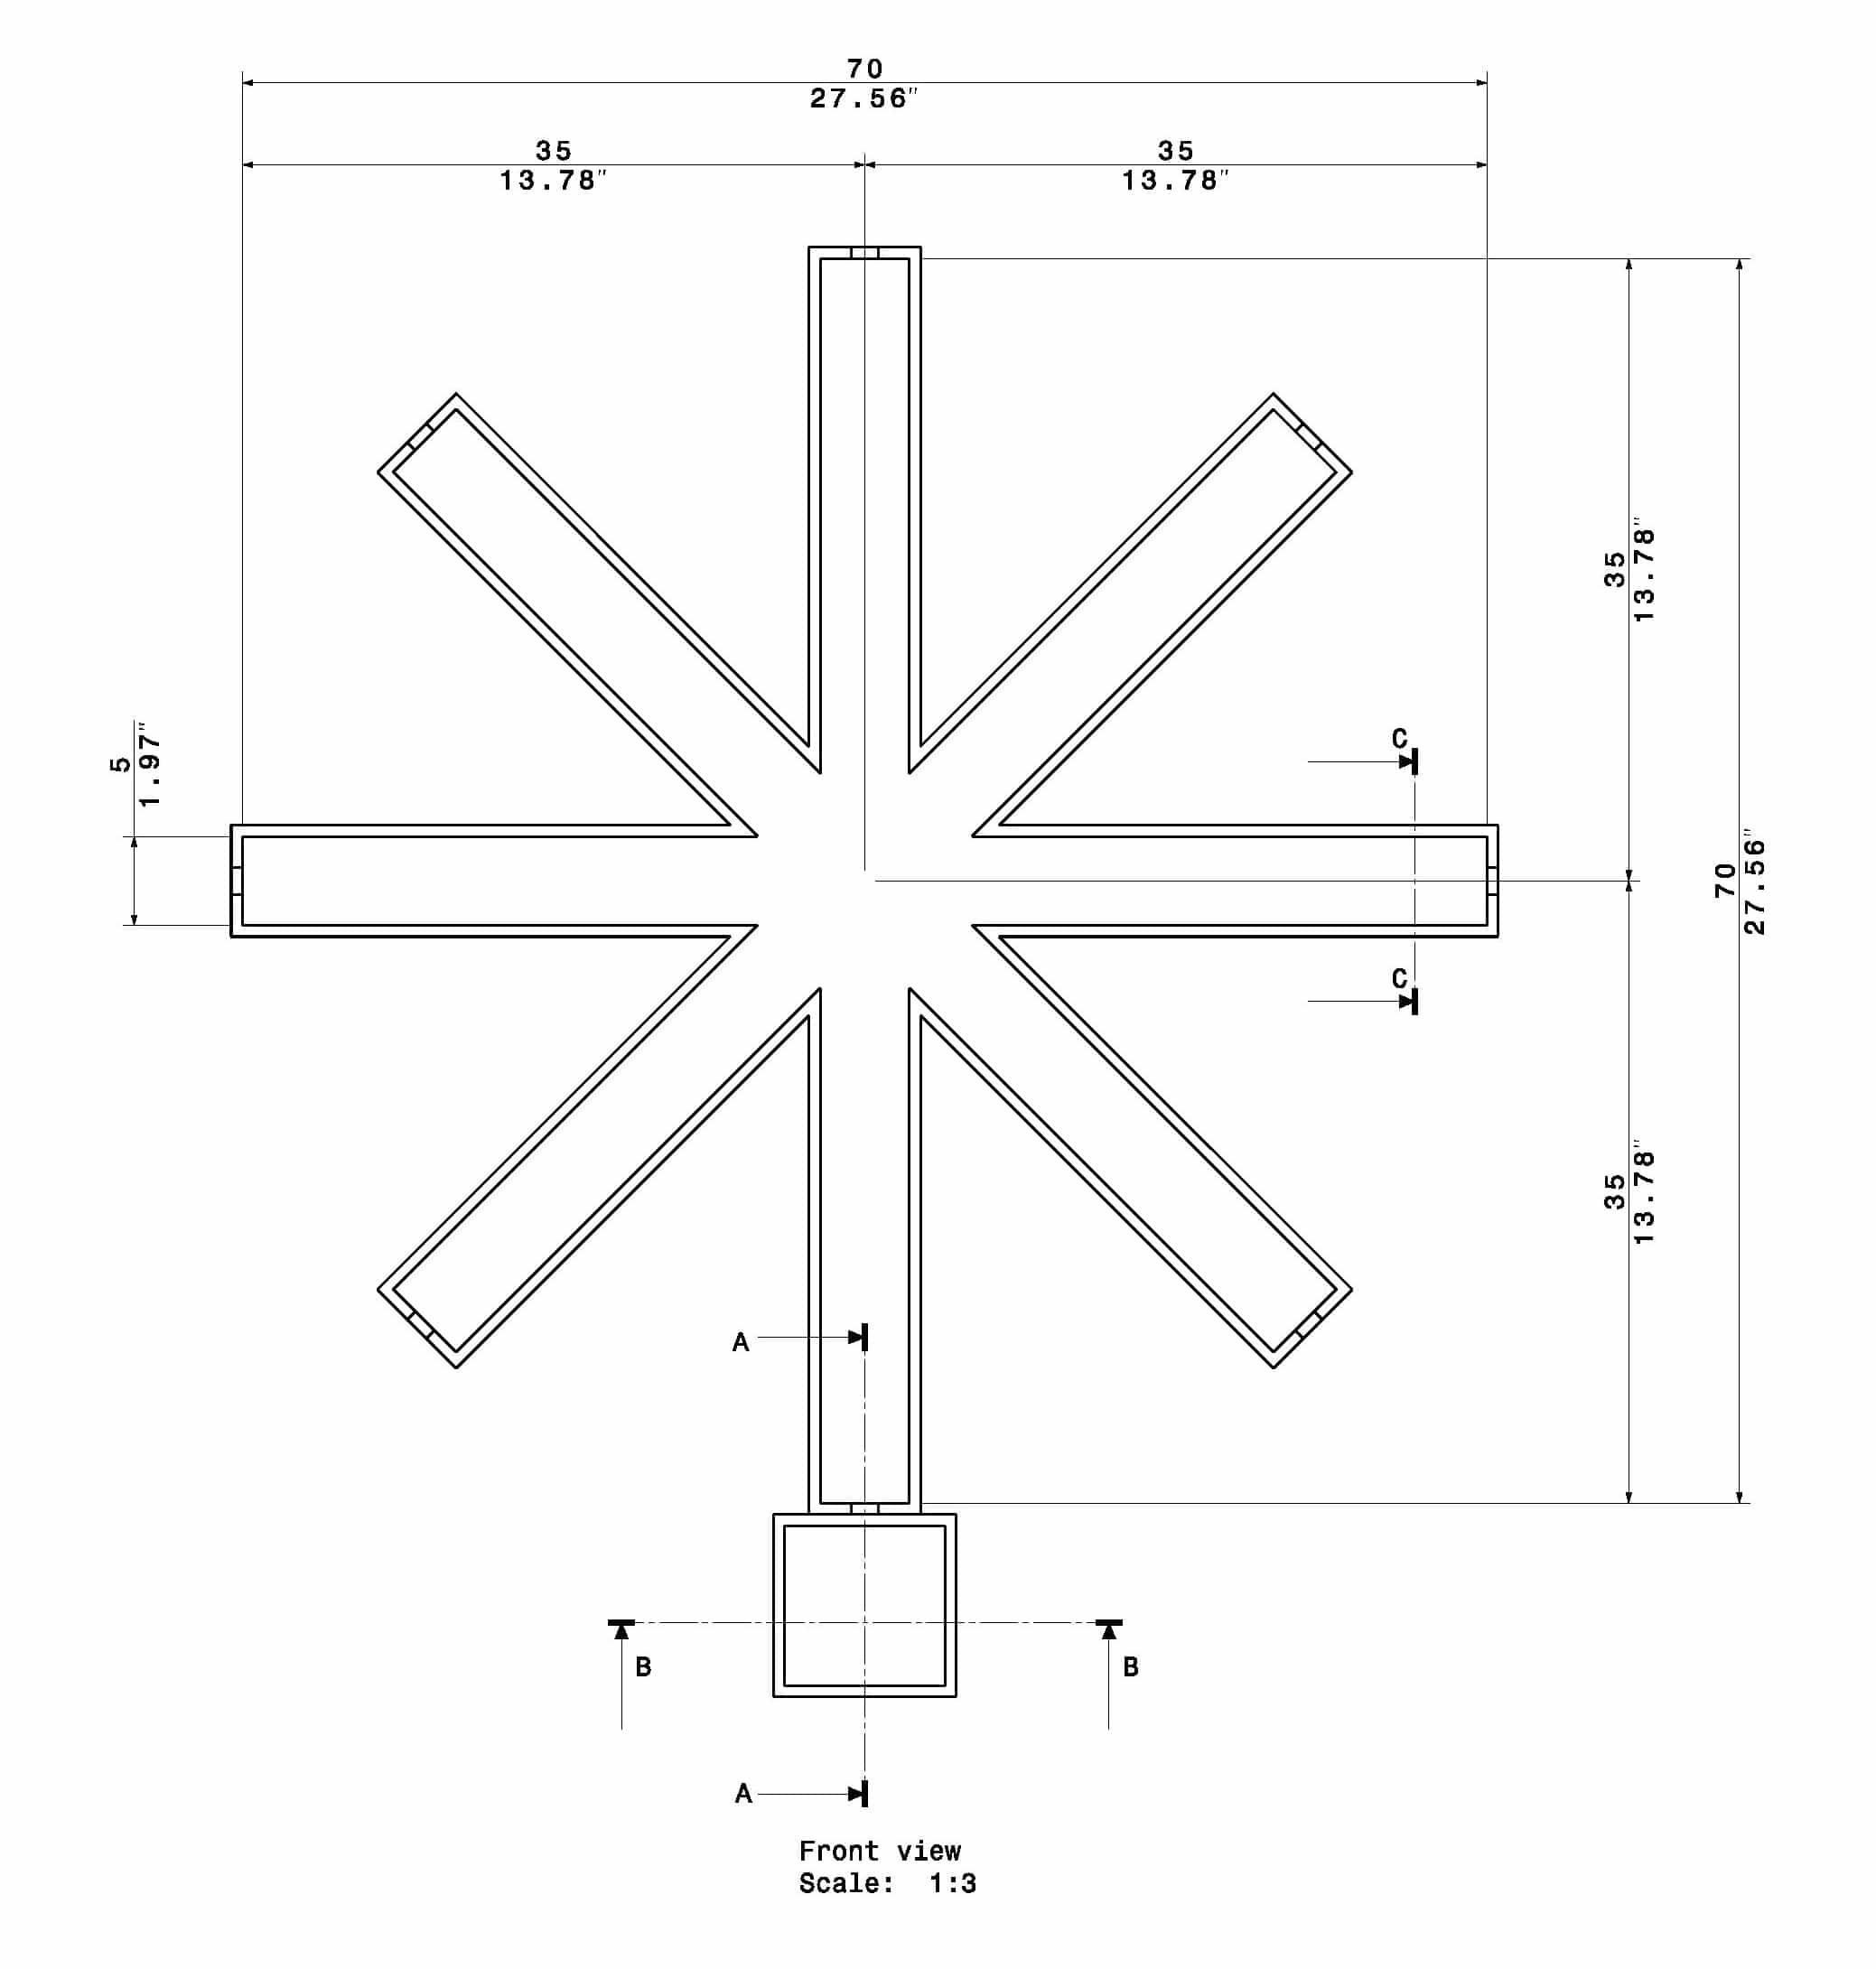 Radial Arm Maze - Goal Box - Mouse - Image 2